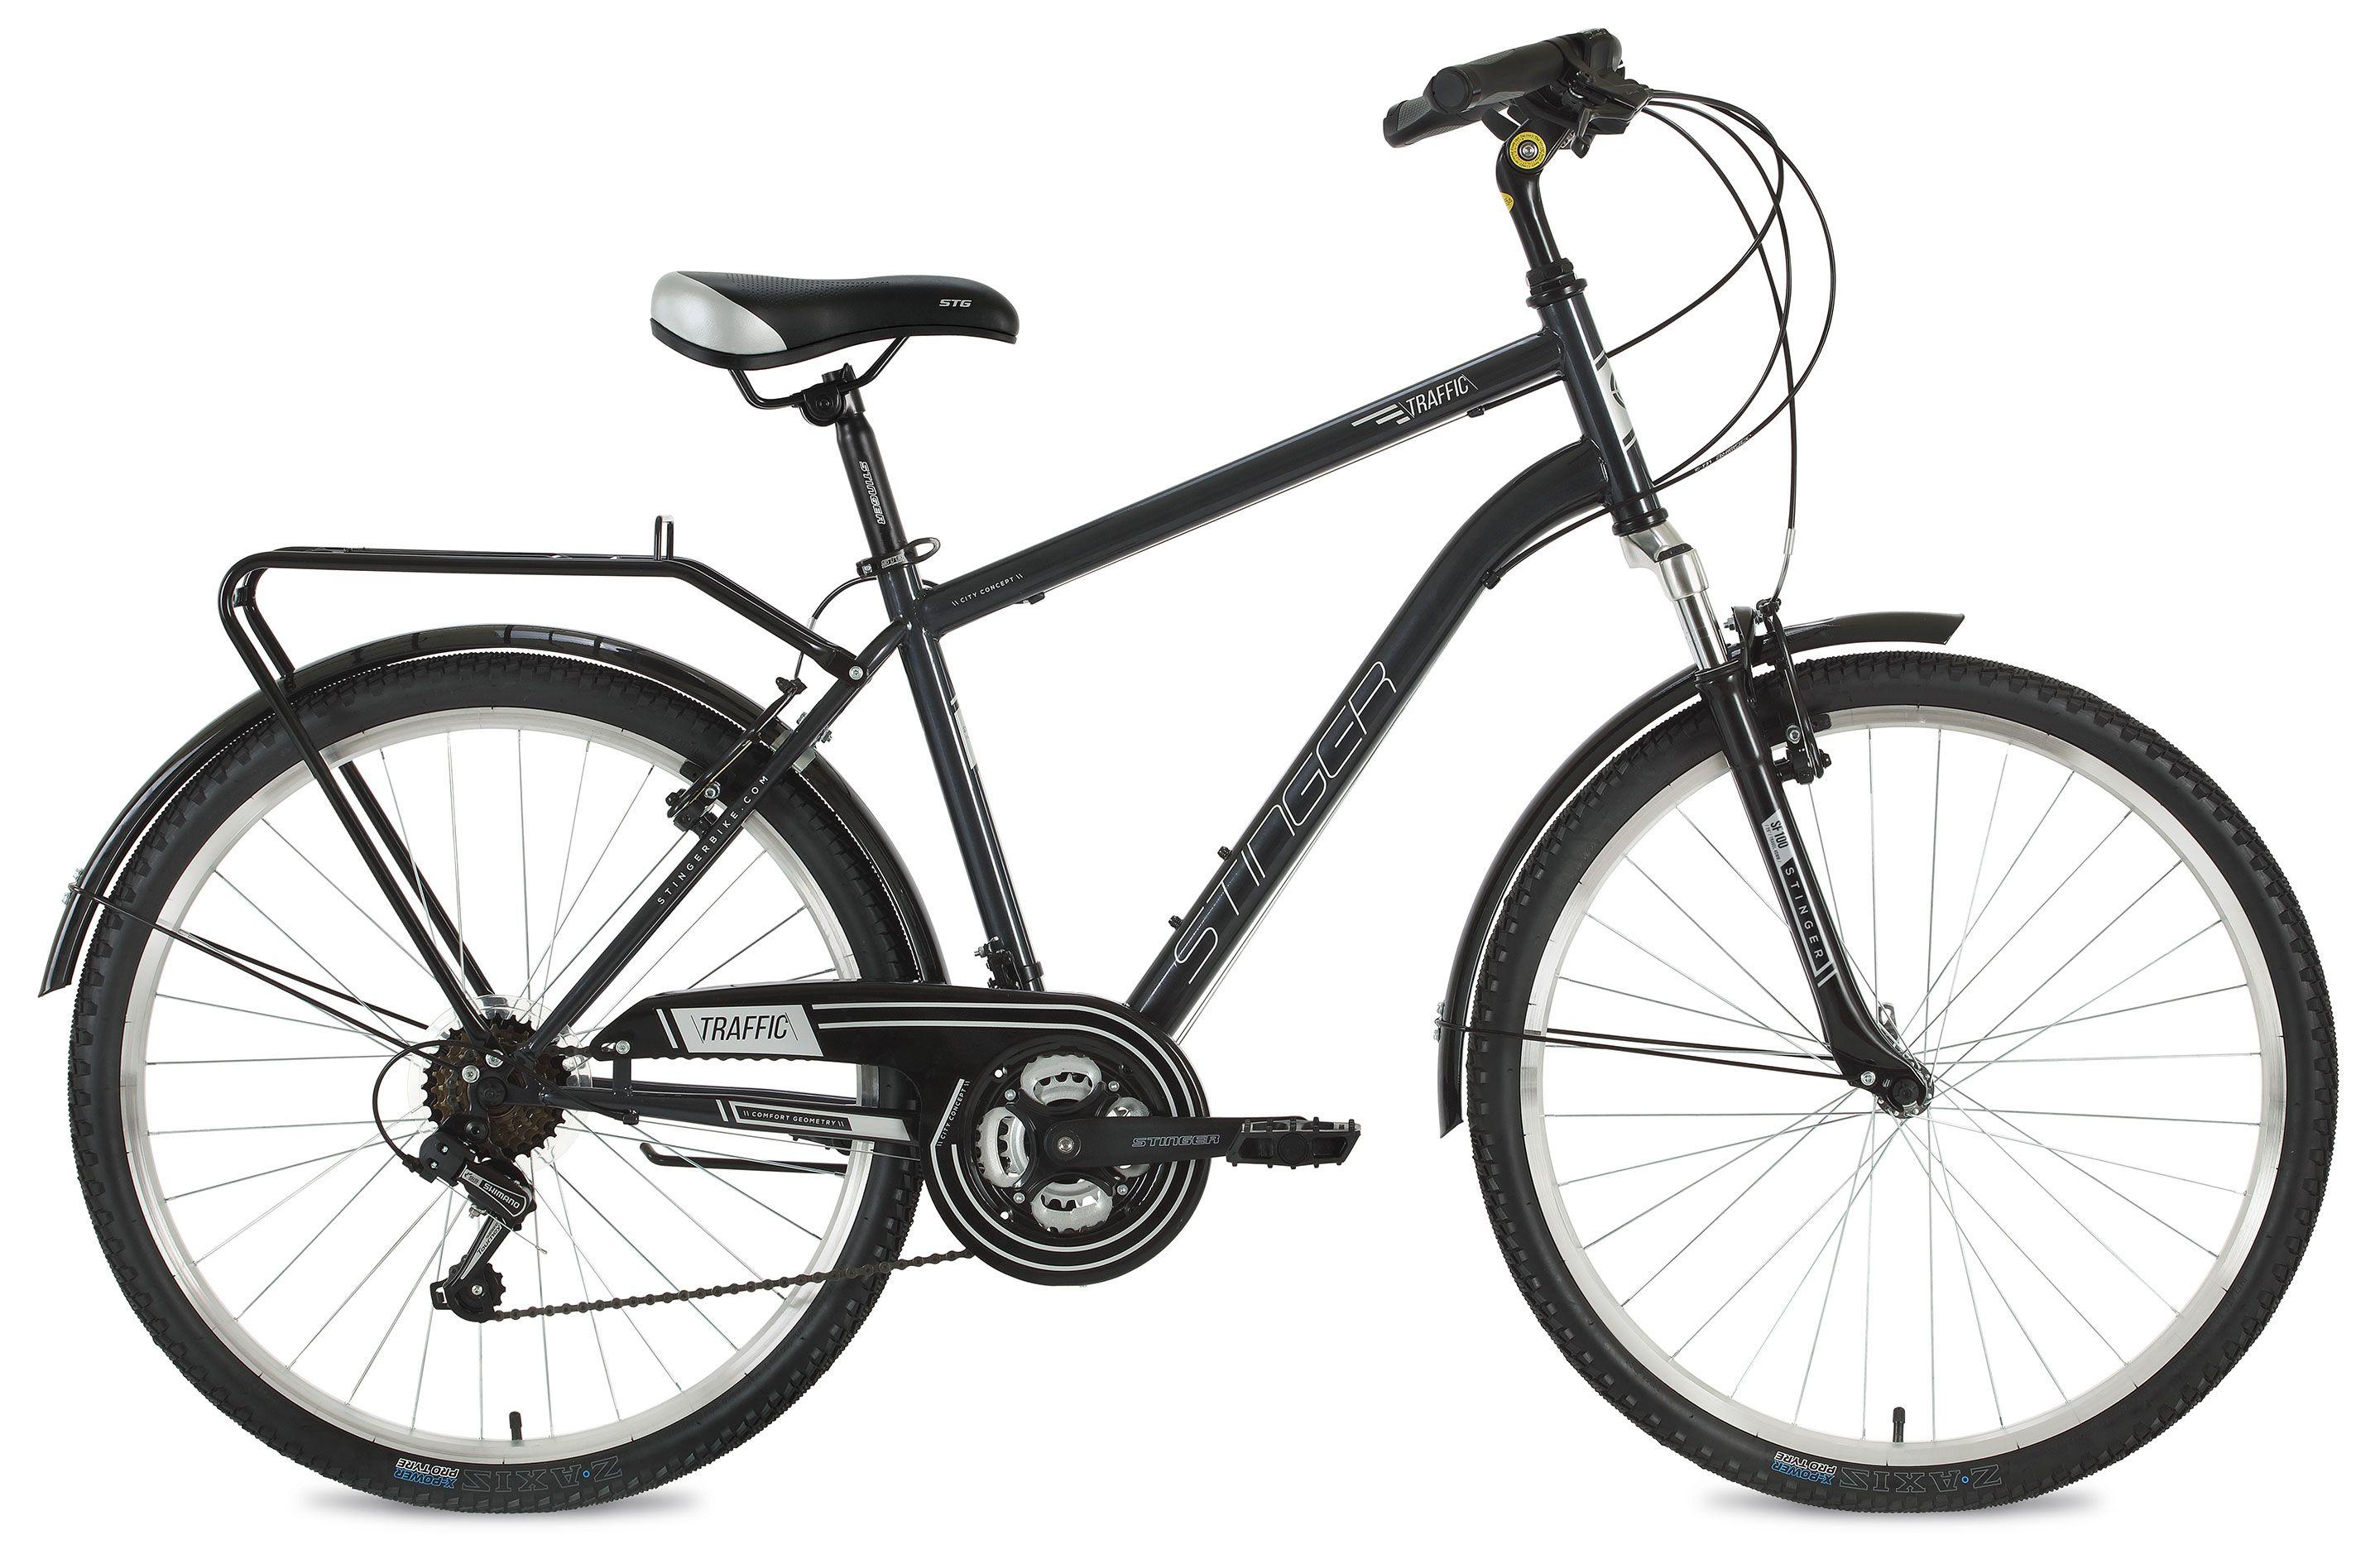 Велосипед Stinger Traffic 26 2018 велосипед stinger valencia 2017